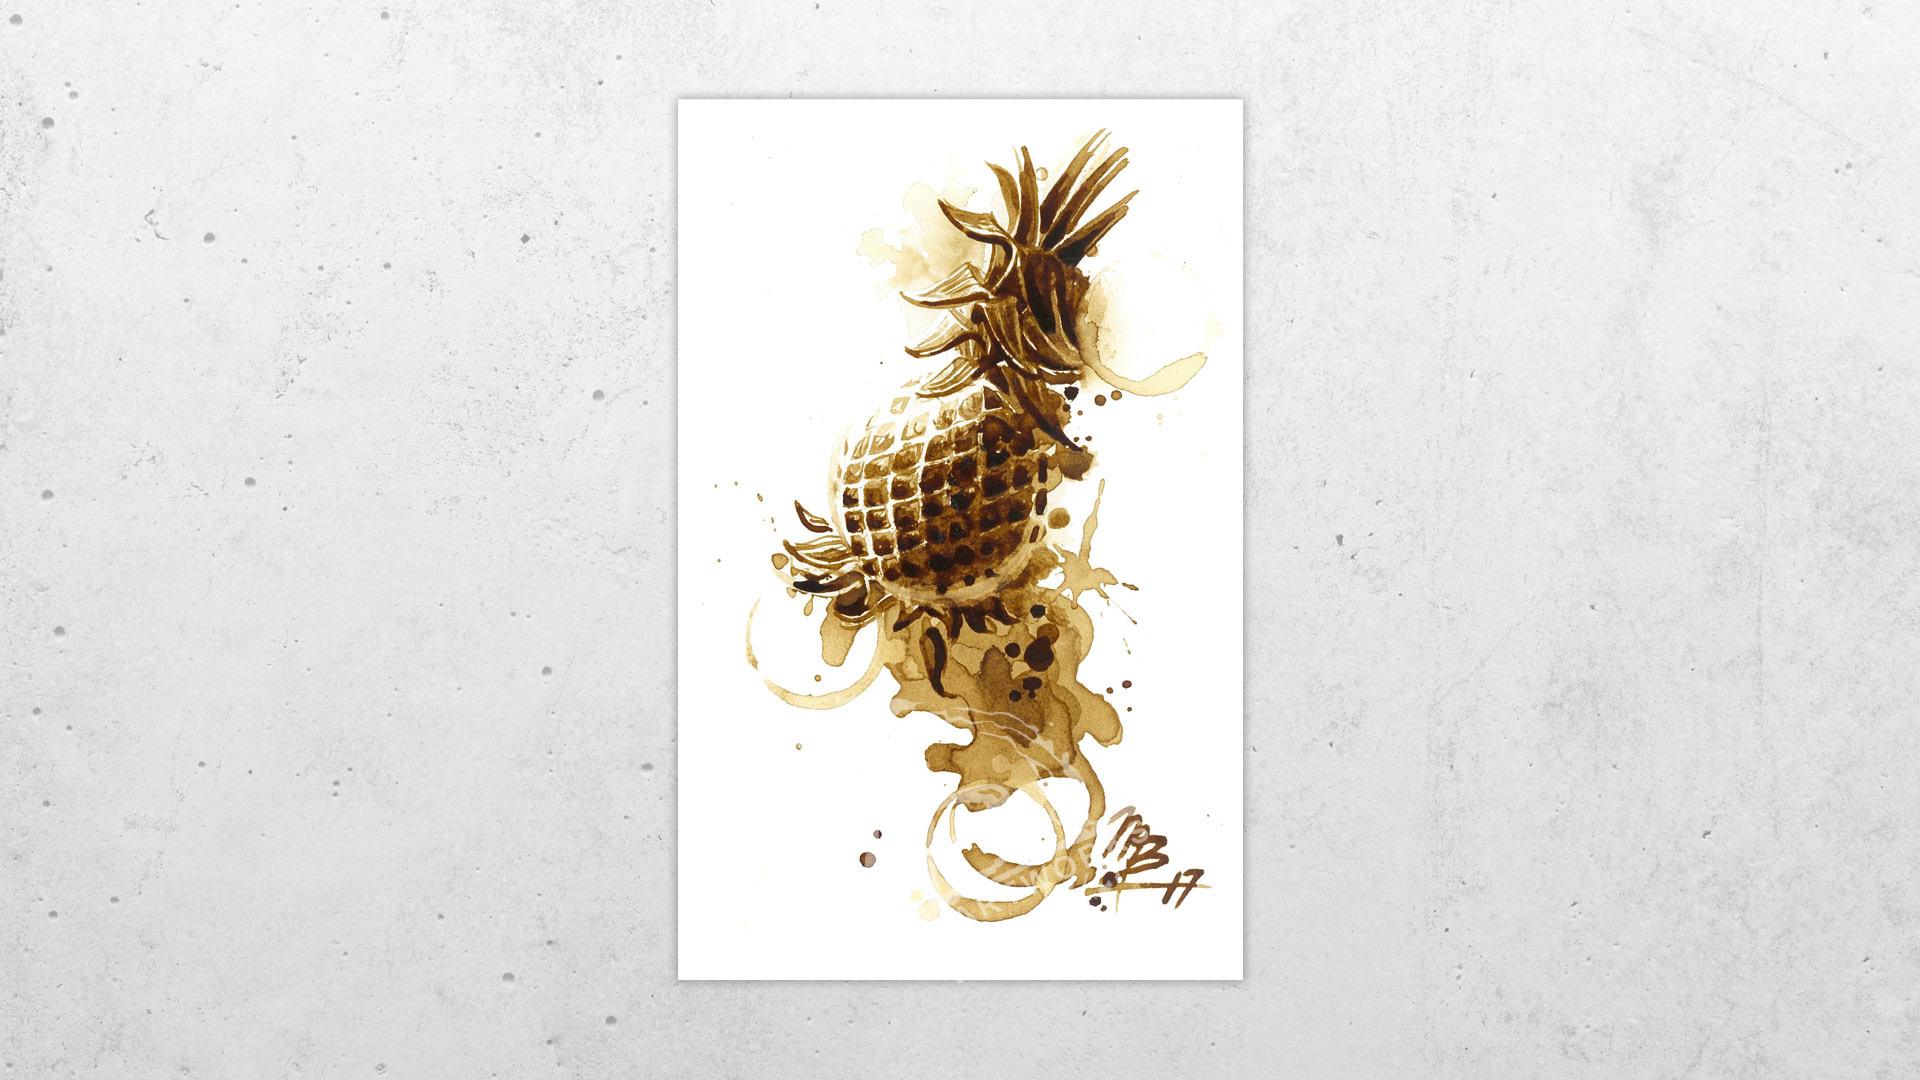 Pineapple-Espresso-Porfolio-Watermarked